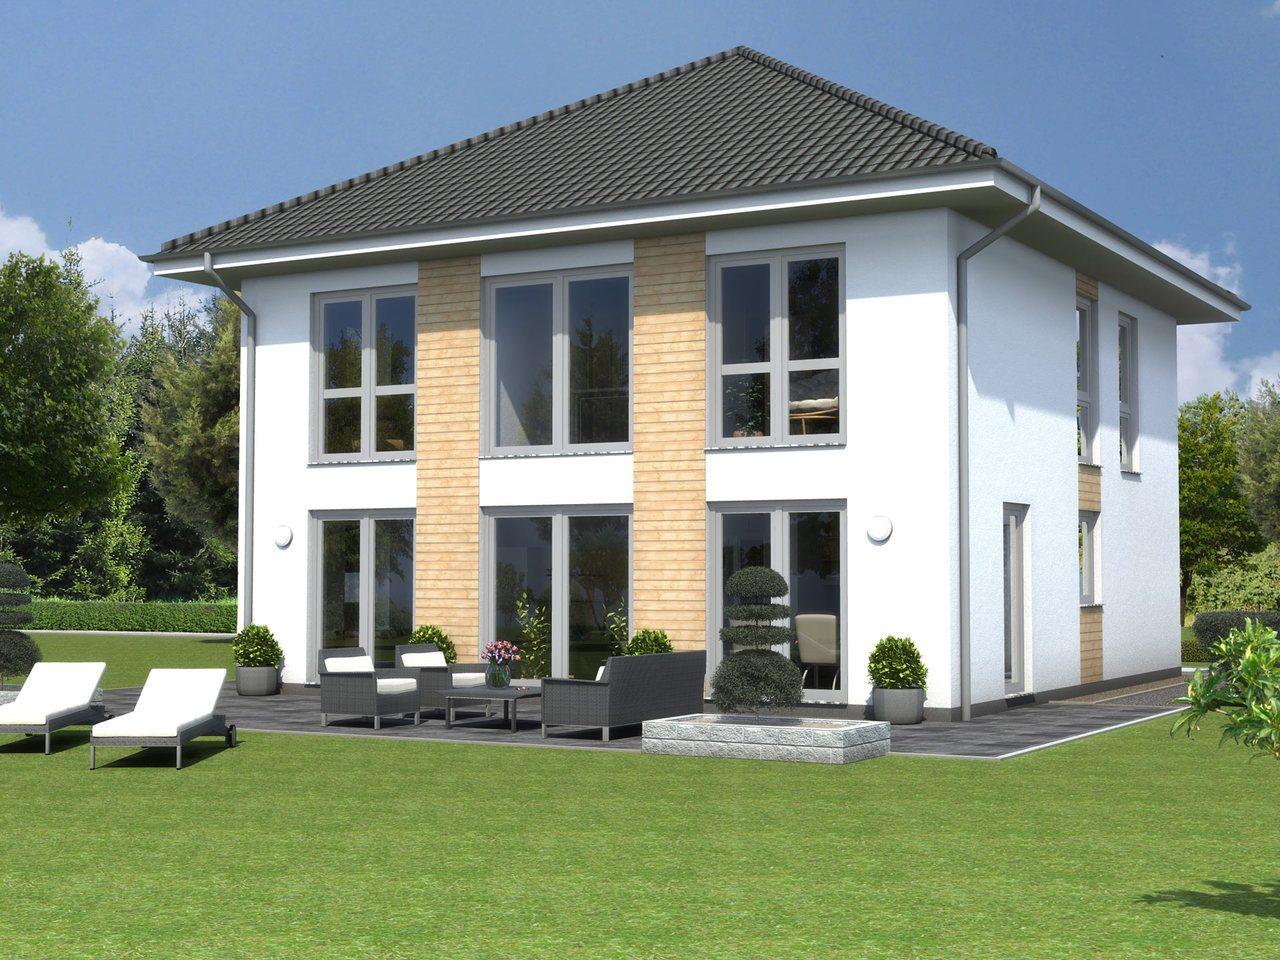 Einfamilienhaus Meran Ansicht 1 - Ästhetik Haus